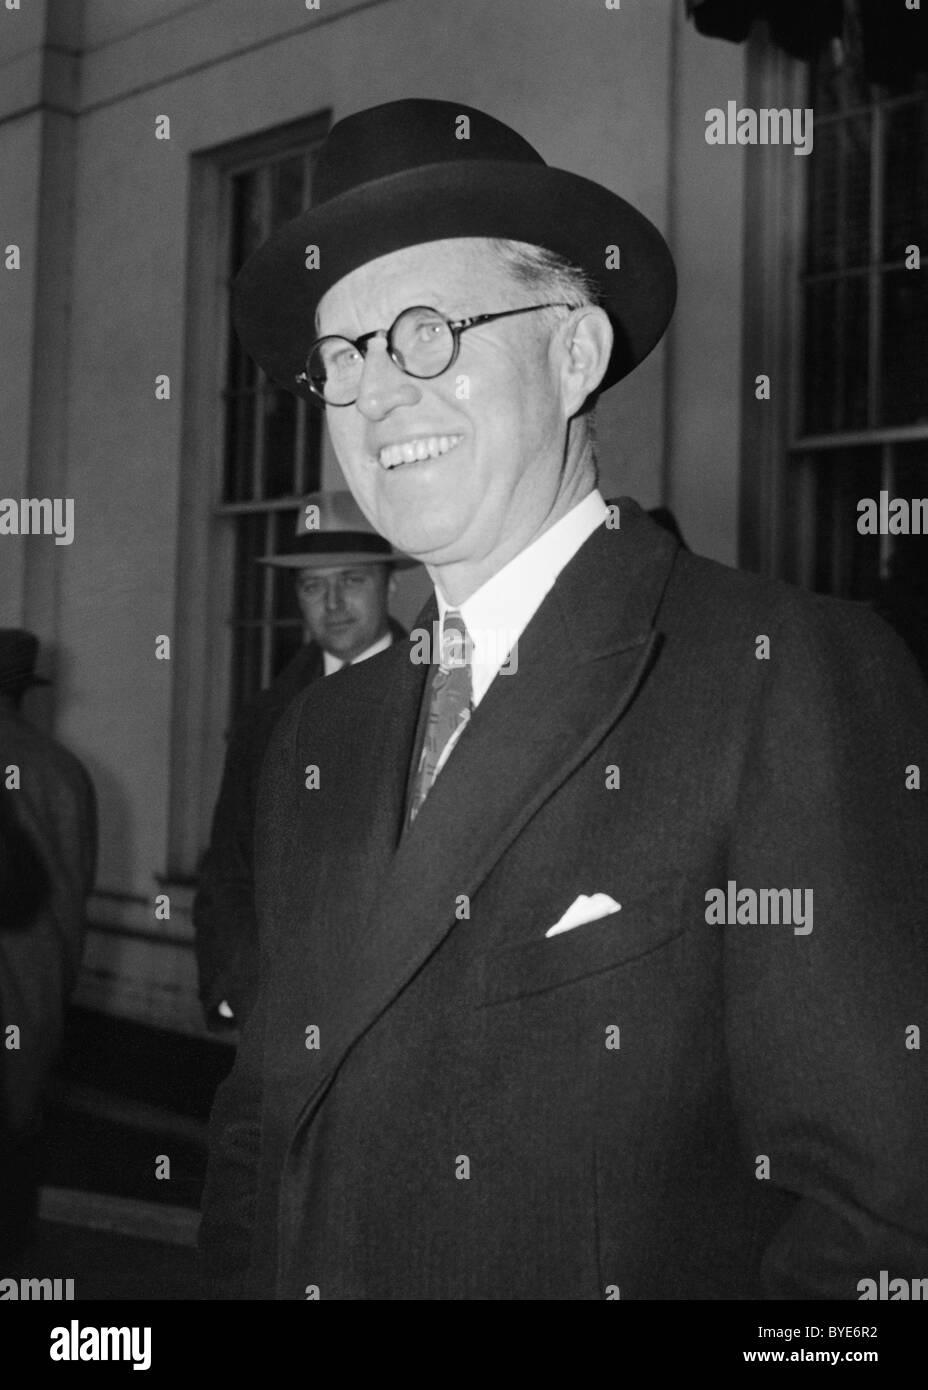 American businessman + political figure Joseph P. Kennedy Sr (1888 - 1969) - father of US President John F. Kennedy - Stock Image